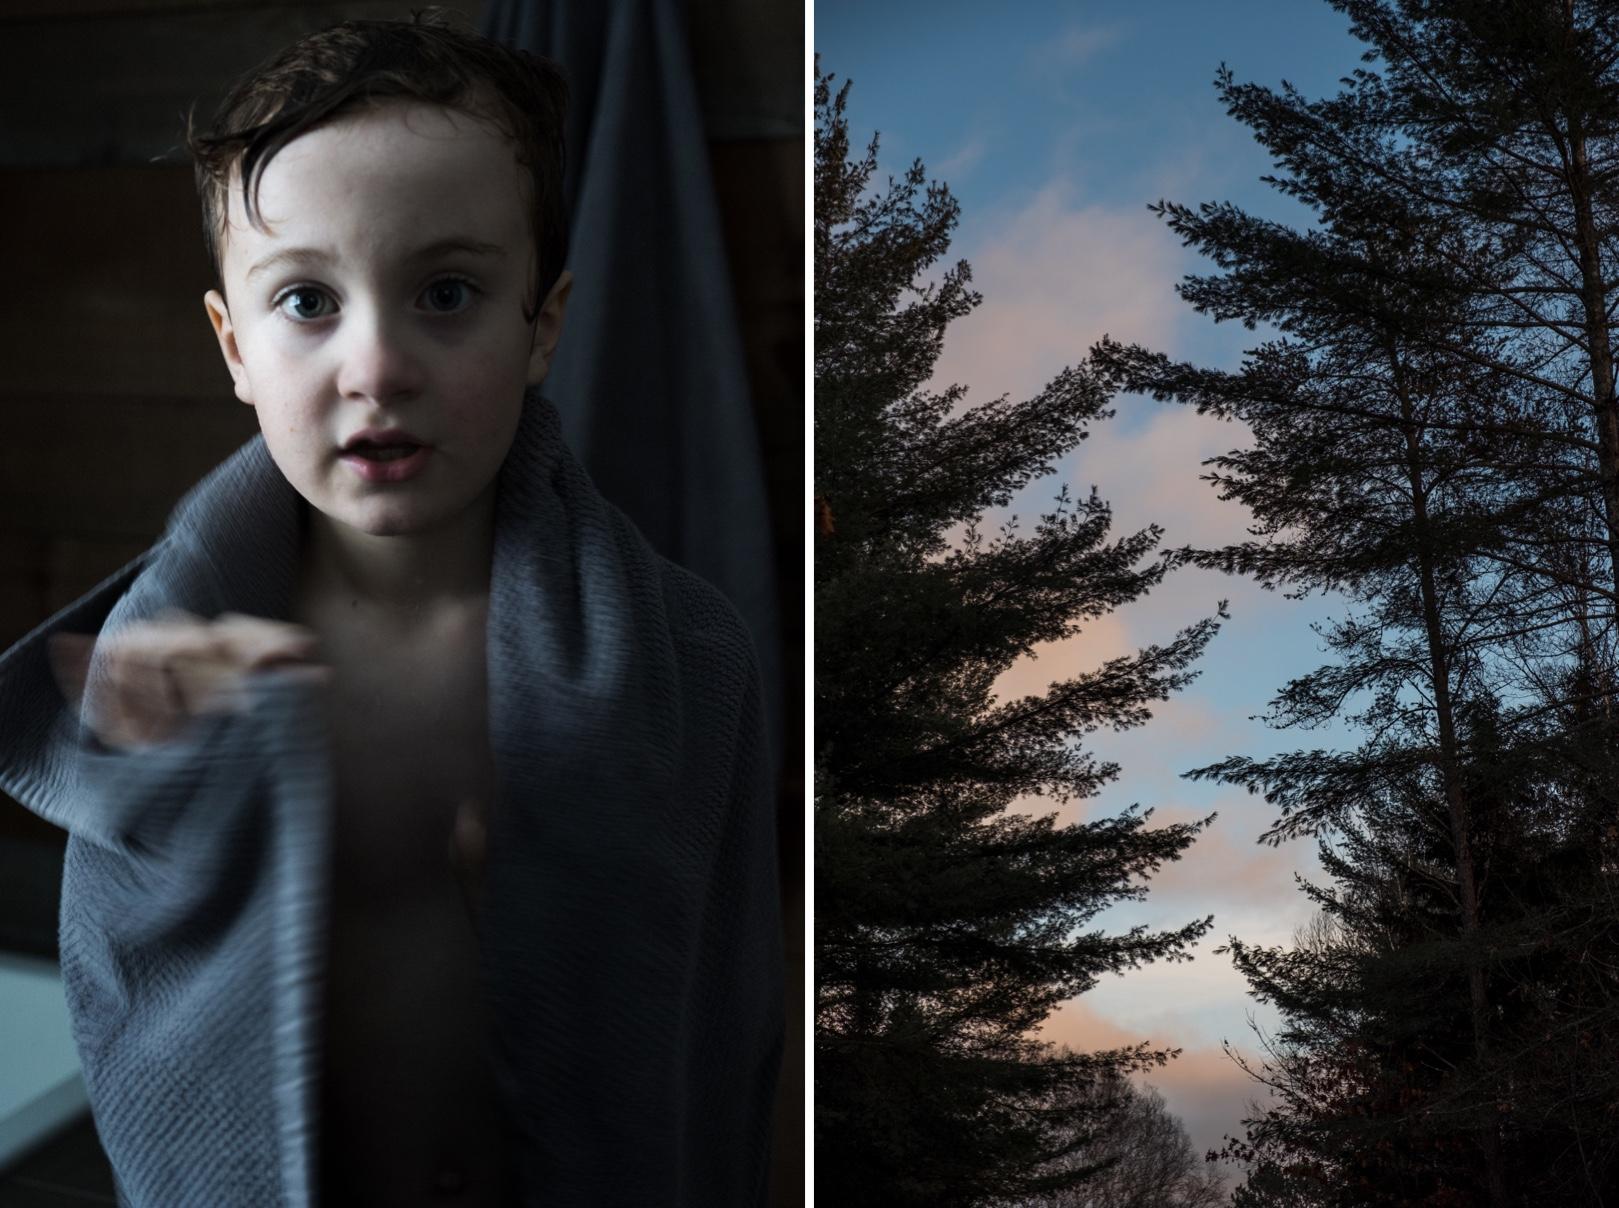 60_LACSIMON NYE 2019-246_LACSIMON NYE 2019-079_Events_Engagement_2018_Travel_Weddings_Photography_best_Portraits.jpg